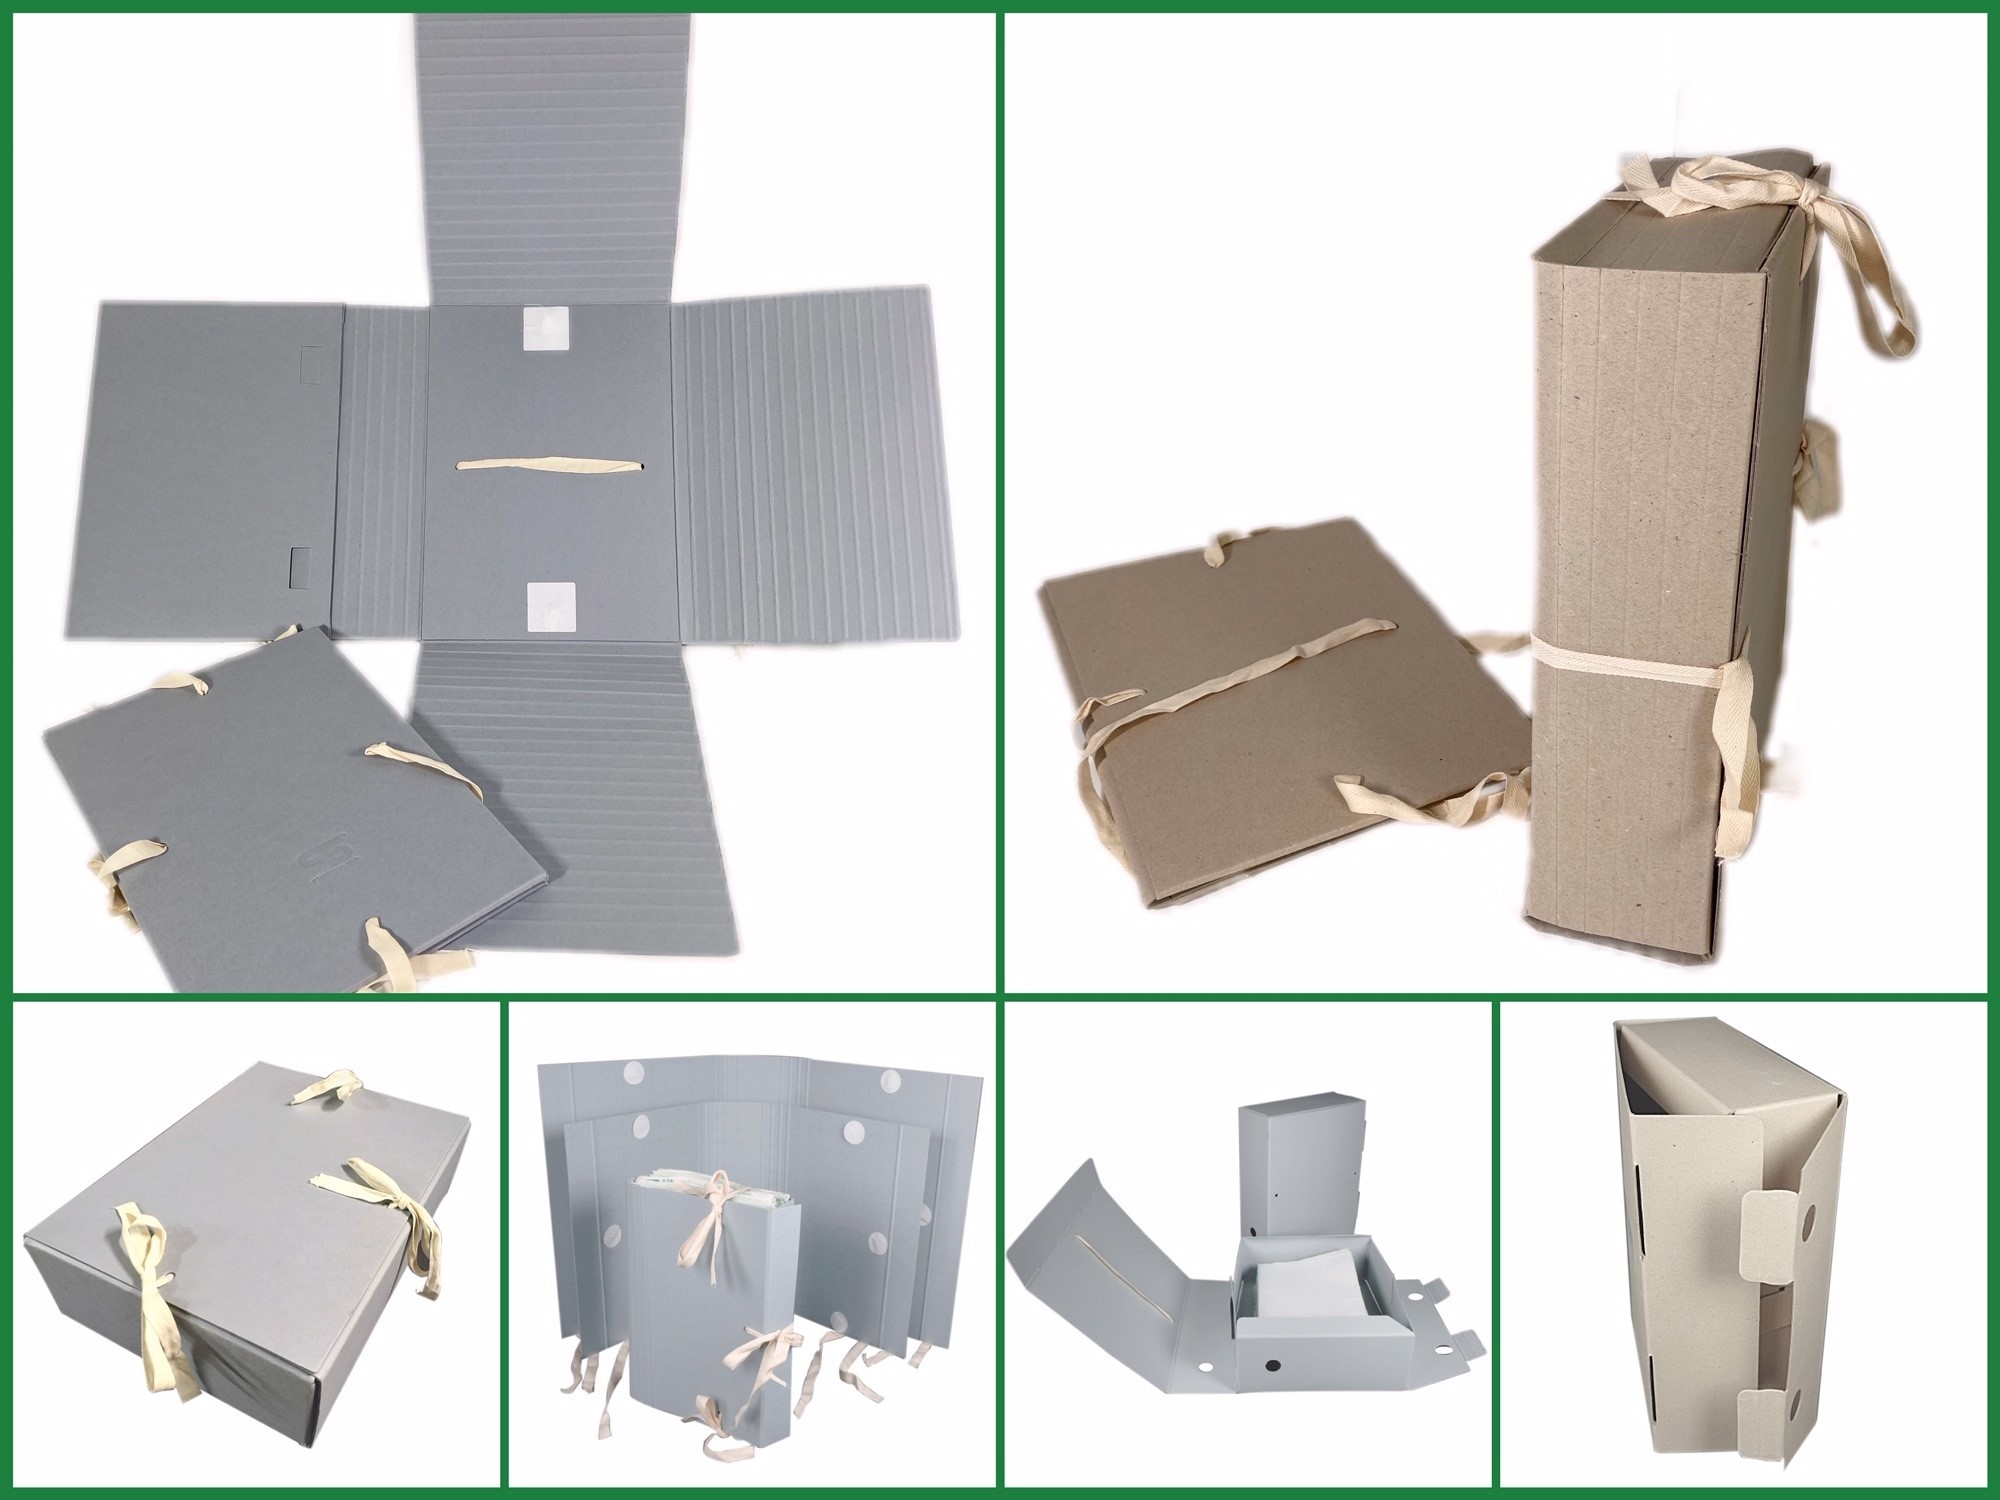 Folder boxes